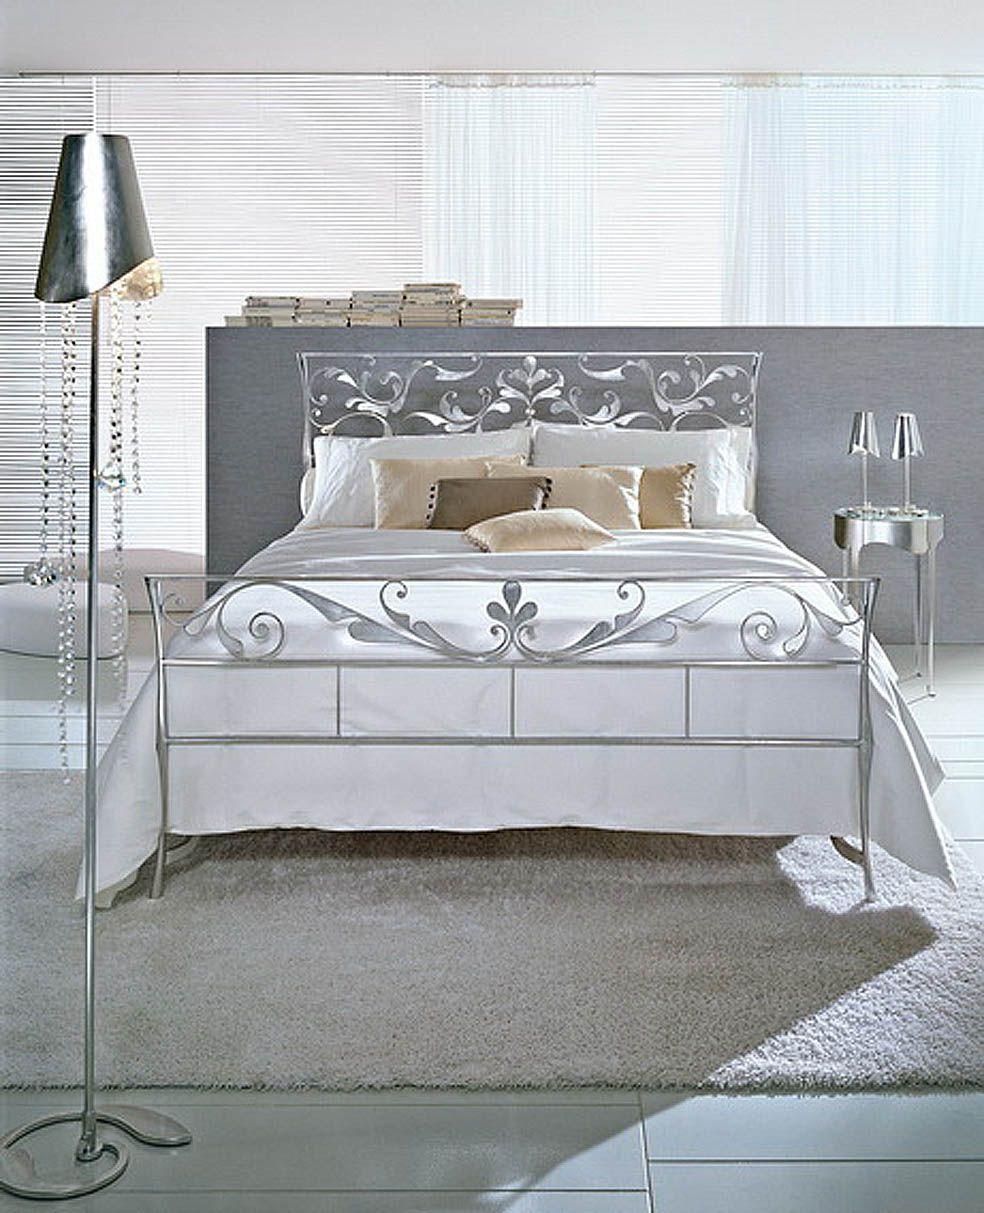 Dormitorios de dise o italiano decoraci n beltr n tu for Camas plegables diseno italiano